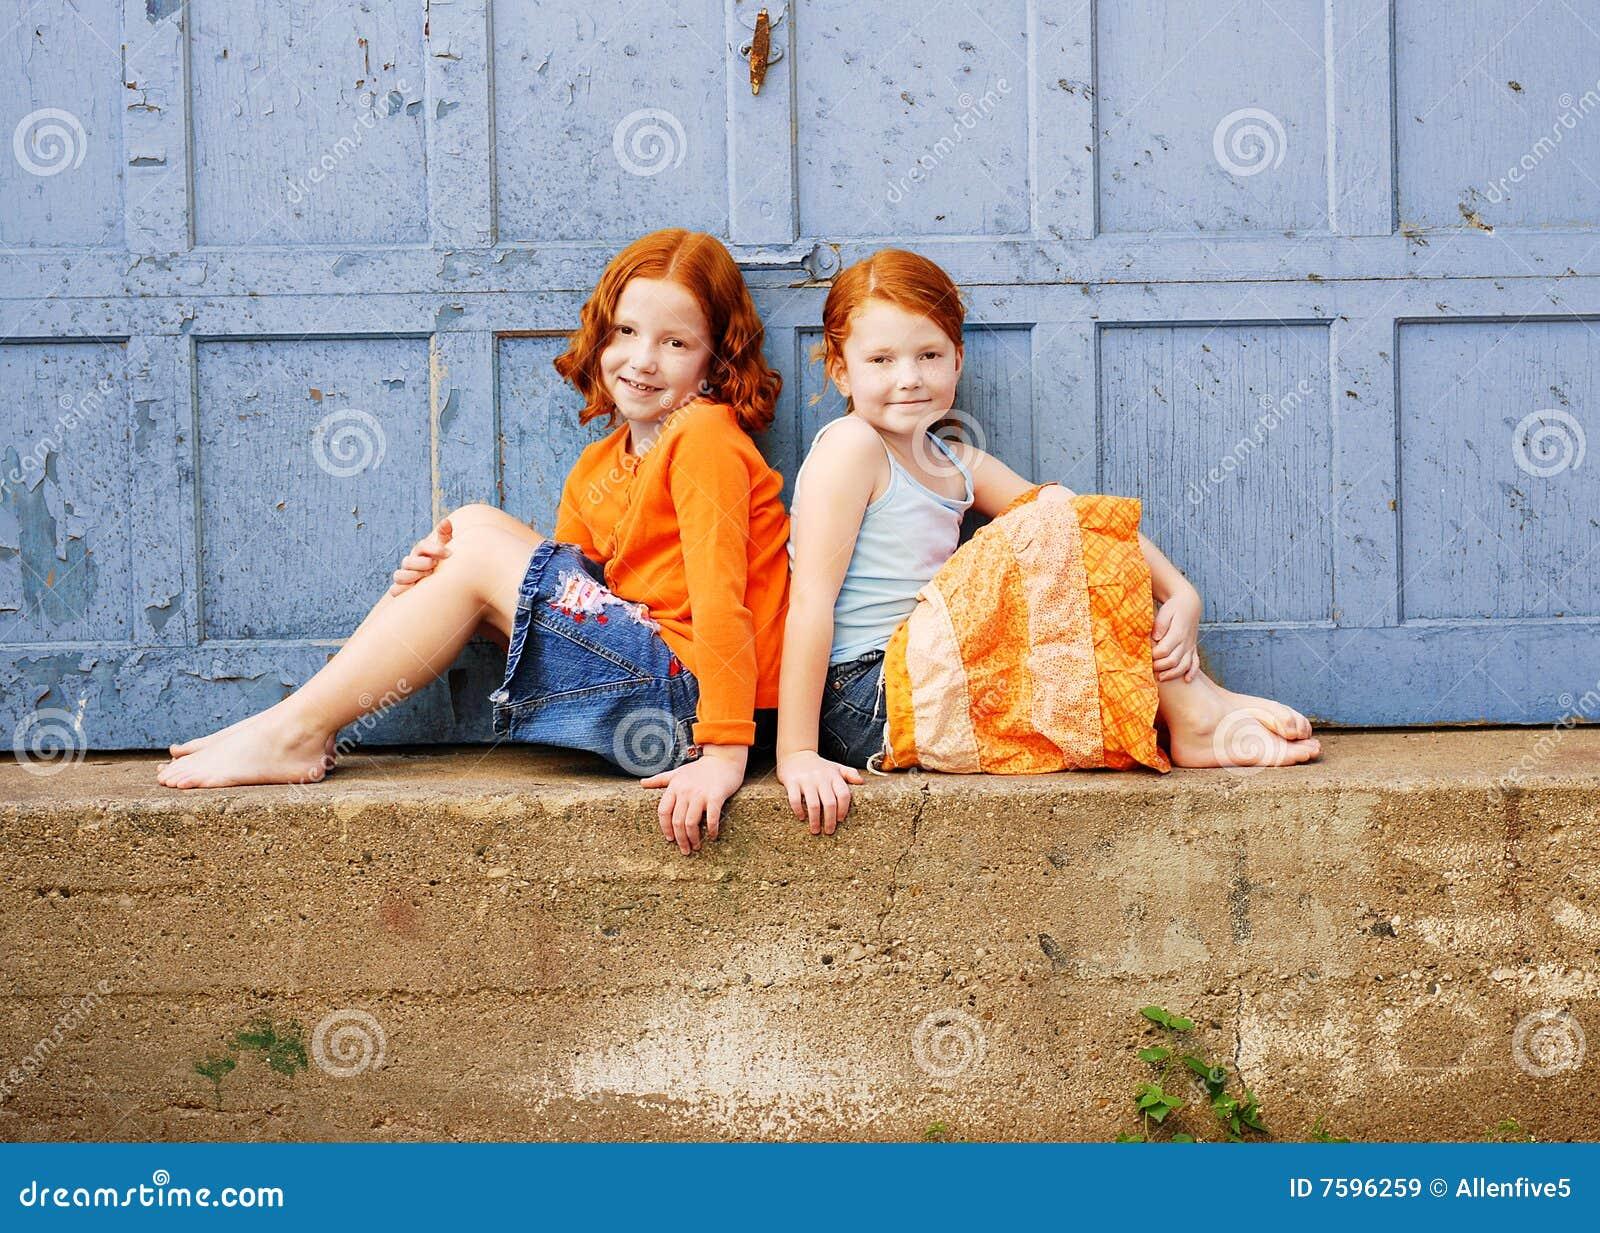 Consider, redhead teen sister